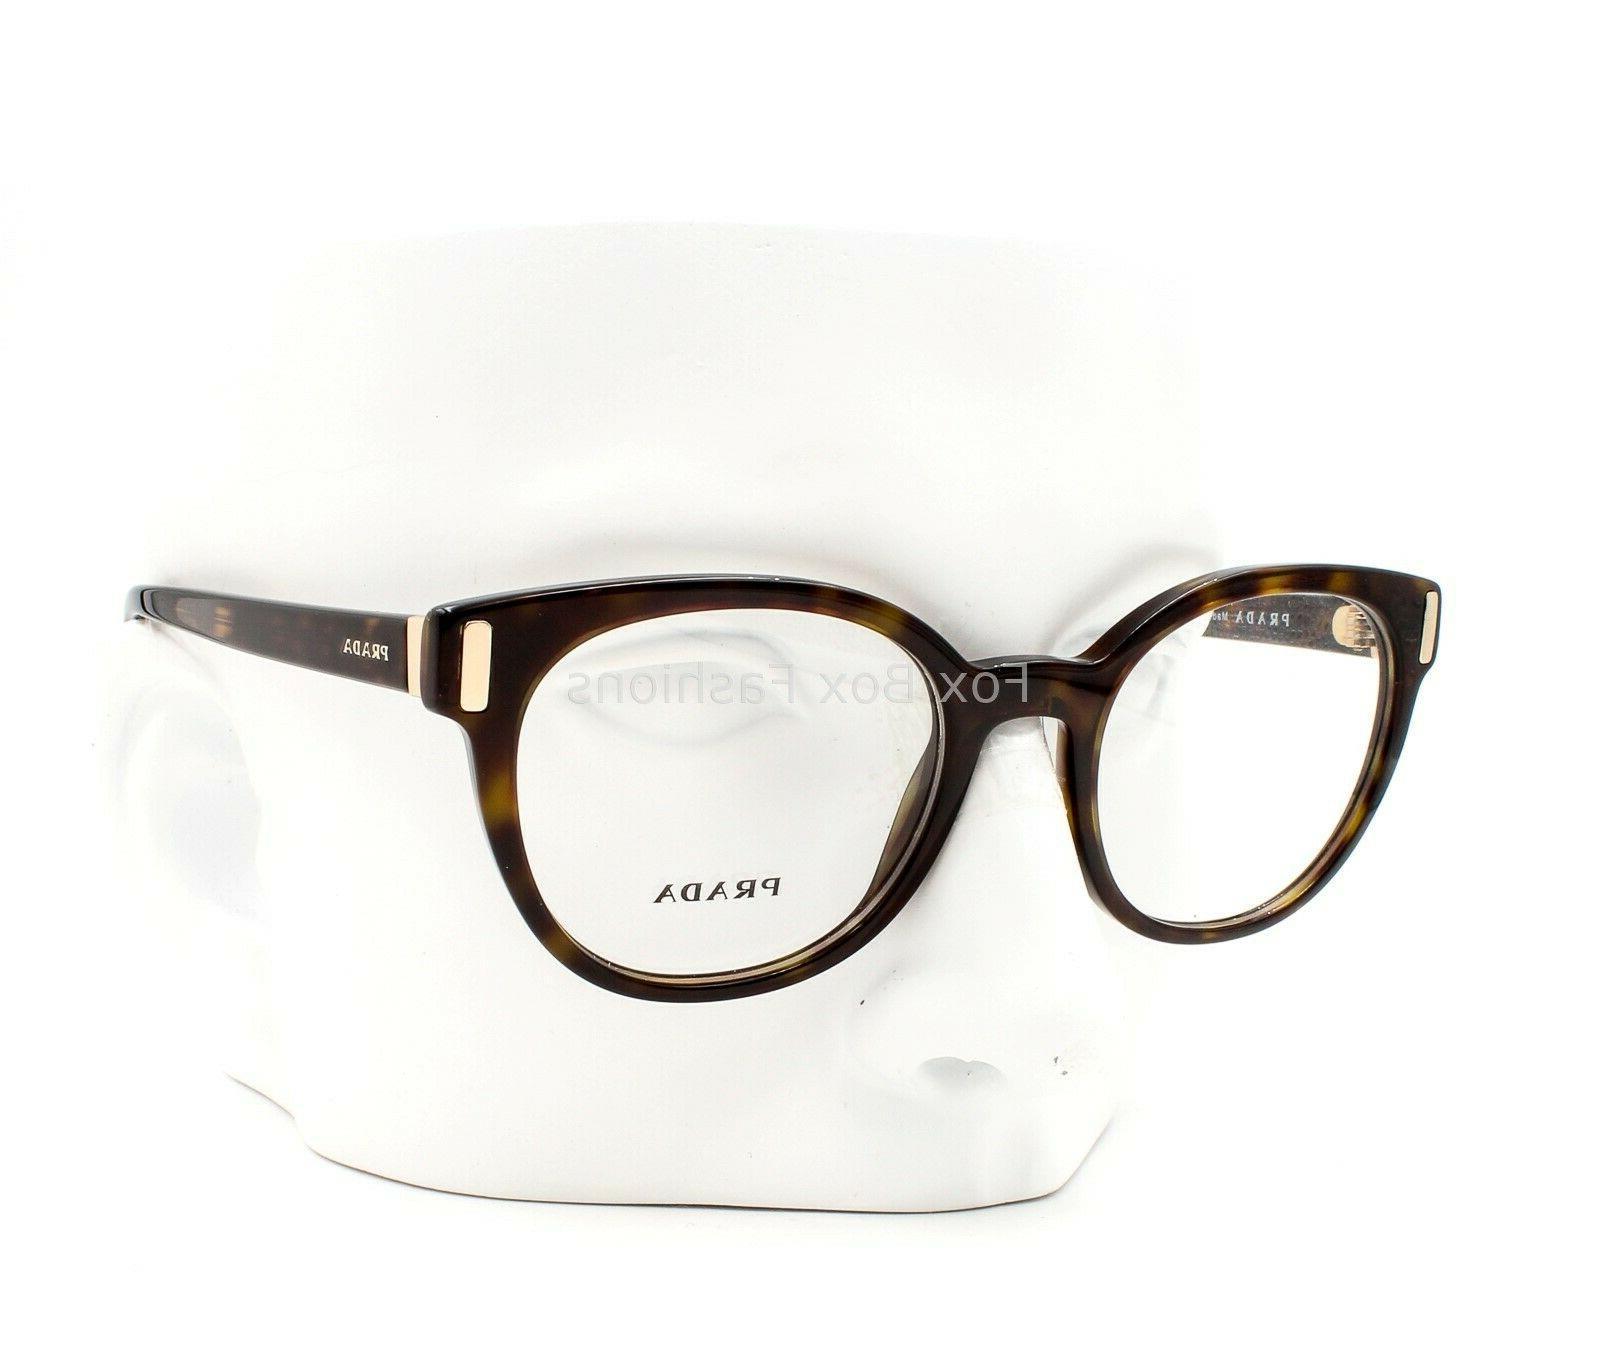 vpr 06t 2au 1o1 eyeglasses frames glasses